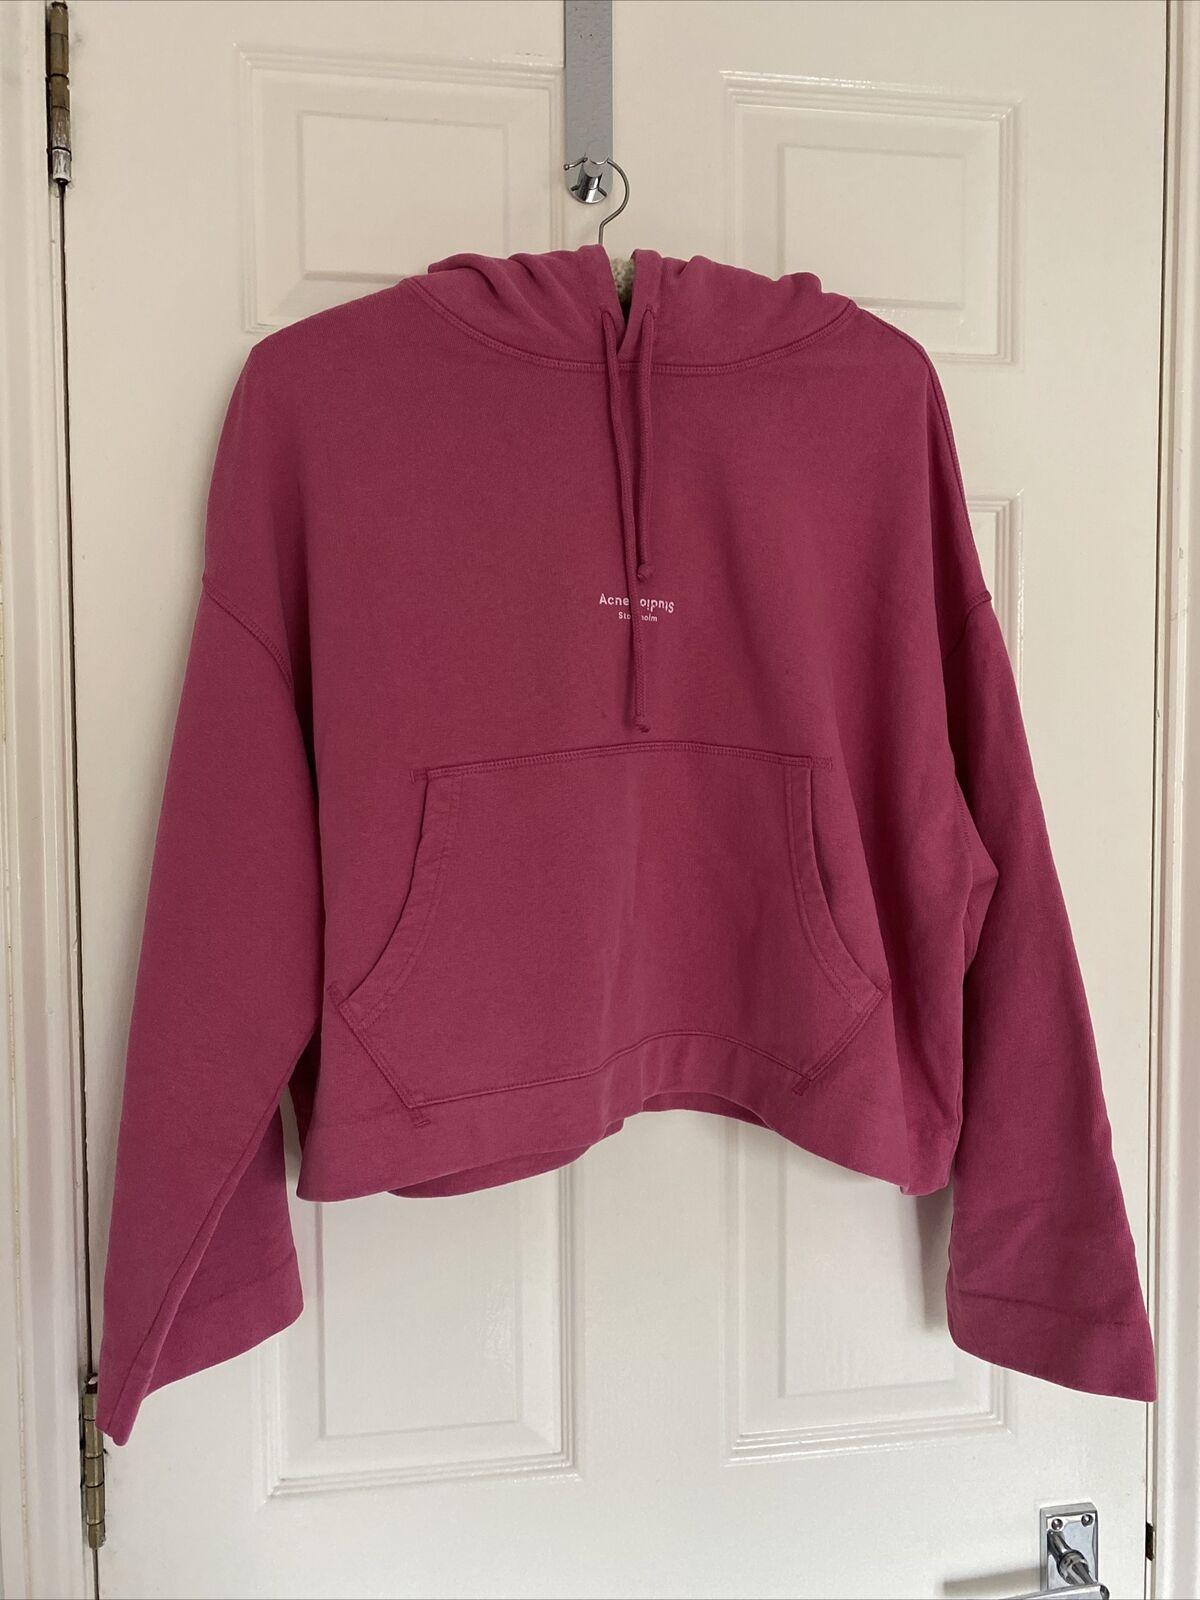 Acne Studios Women Hoodie Pink Size XS